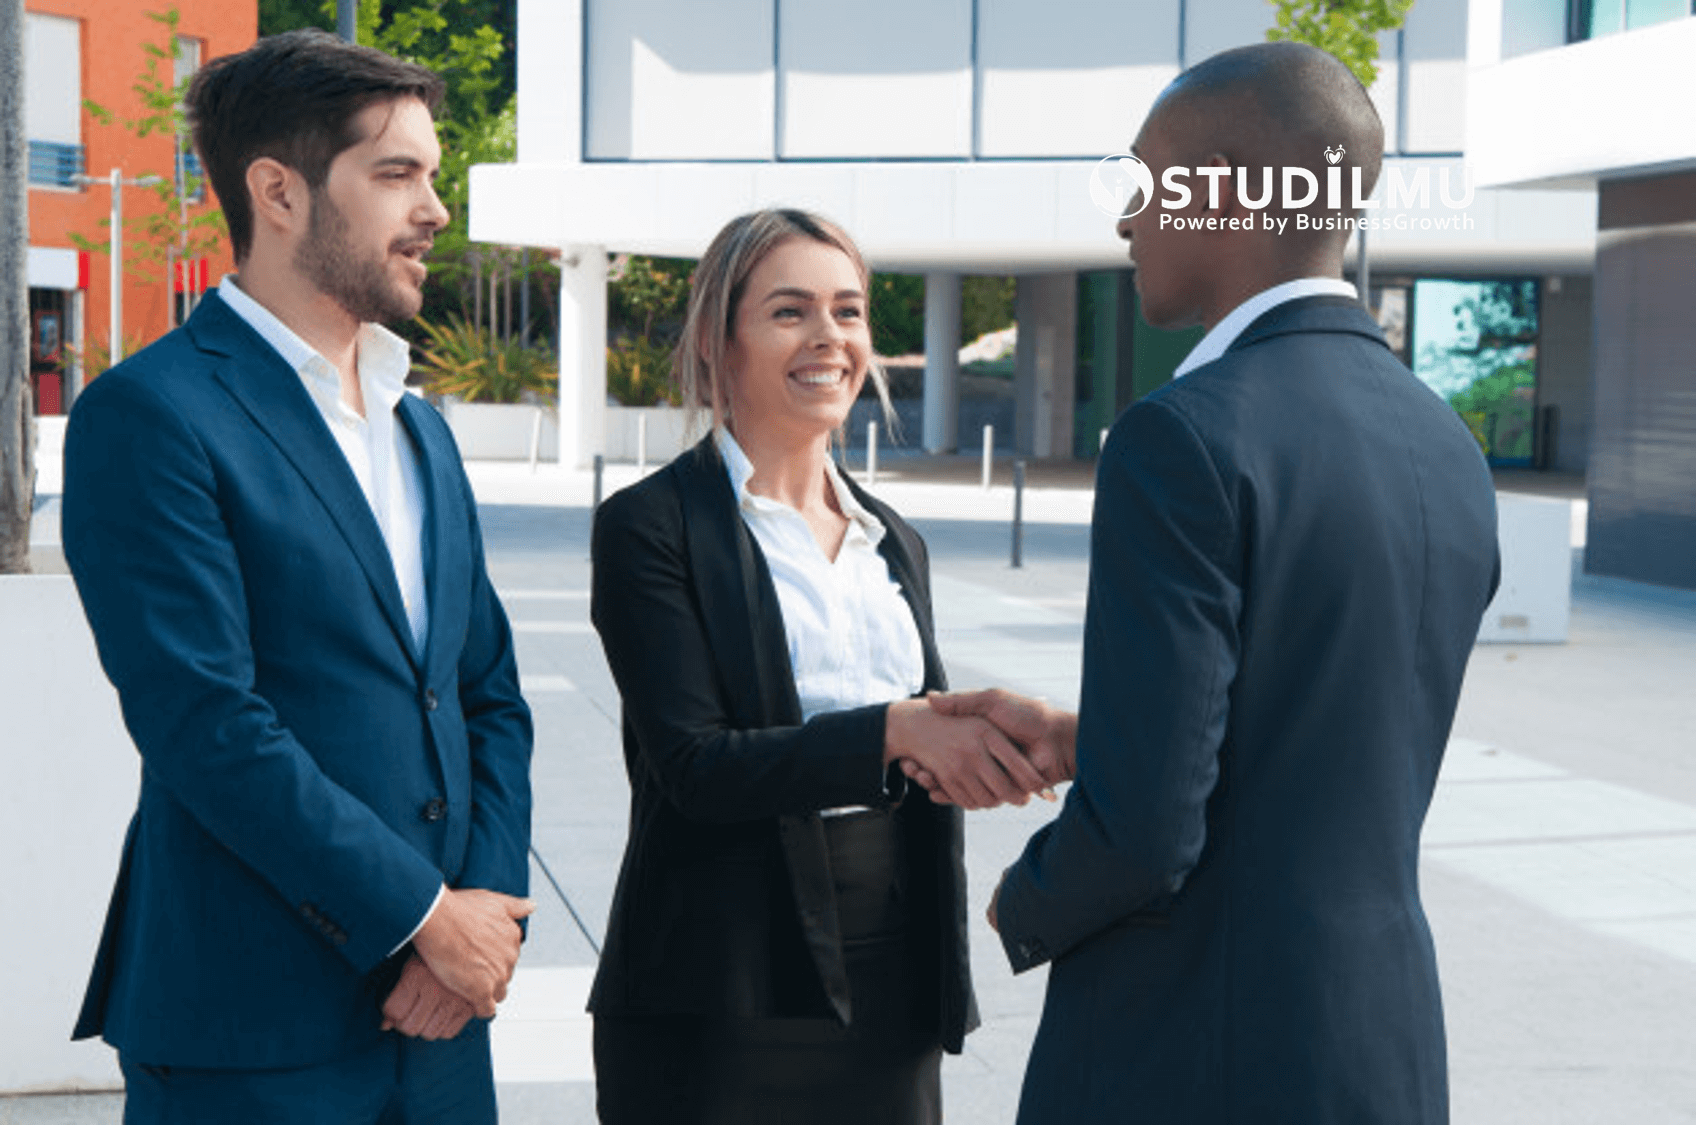 7 Cara Menjadi Lebih Percaya Diri Ketika Bertemu Klien